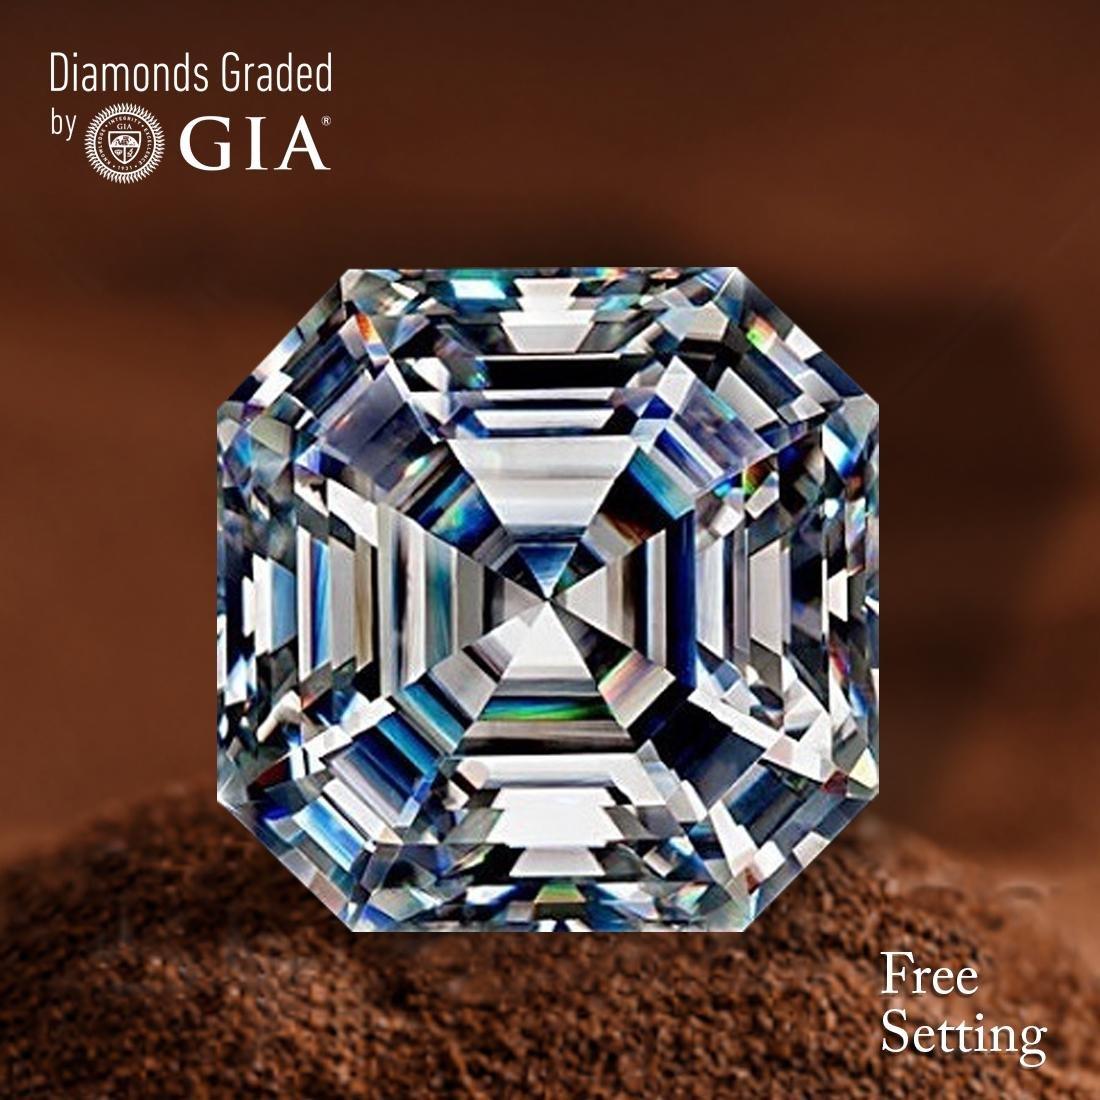 3.14 ct, Color I/IF, Sq. Emerald cut Diamond